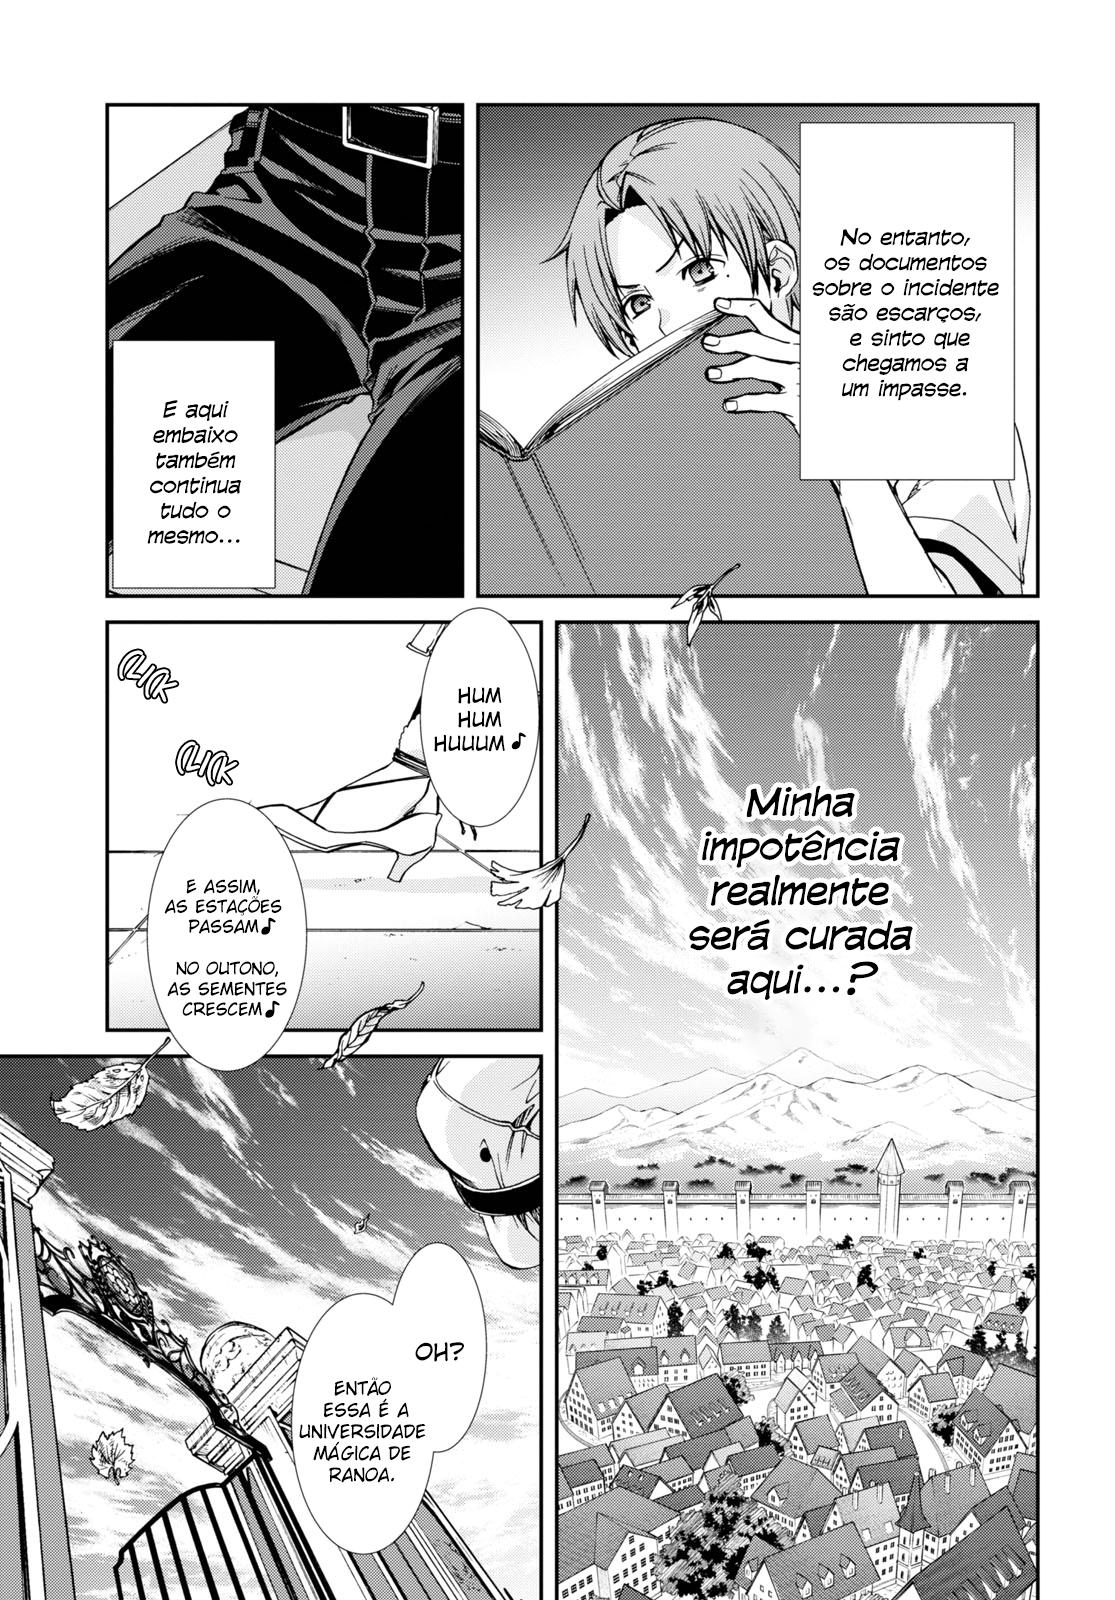 Mushoku Tensei: Isekai Ittara Honki Dasu / Mushoku Tensei: Jobless Reincarnation Mangá Online Capítulo 64 em Português